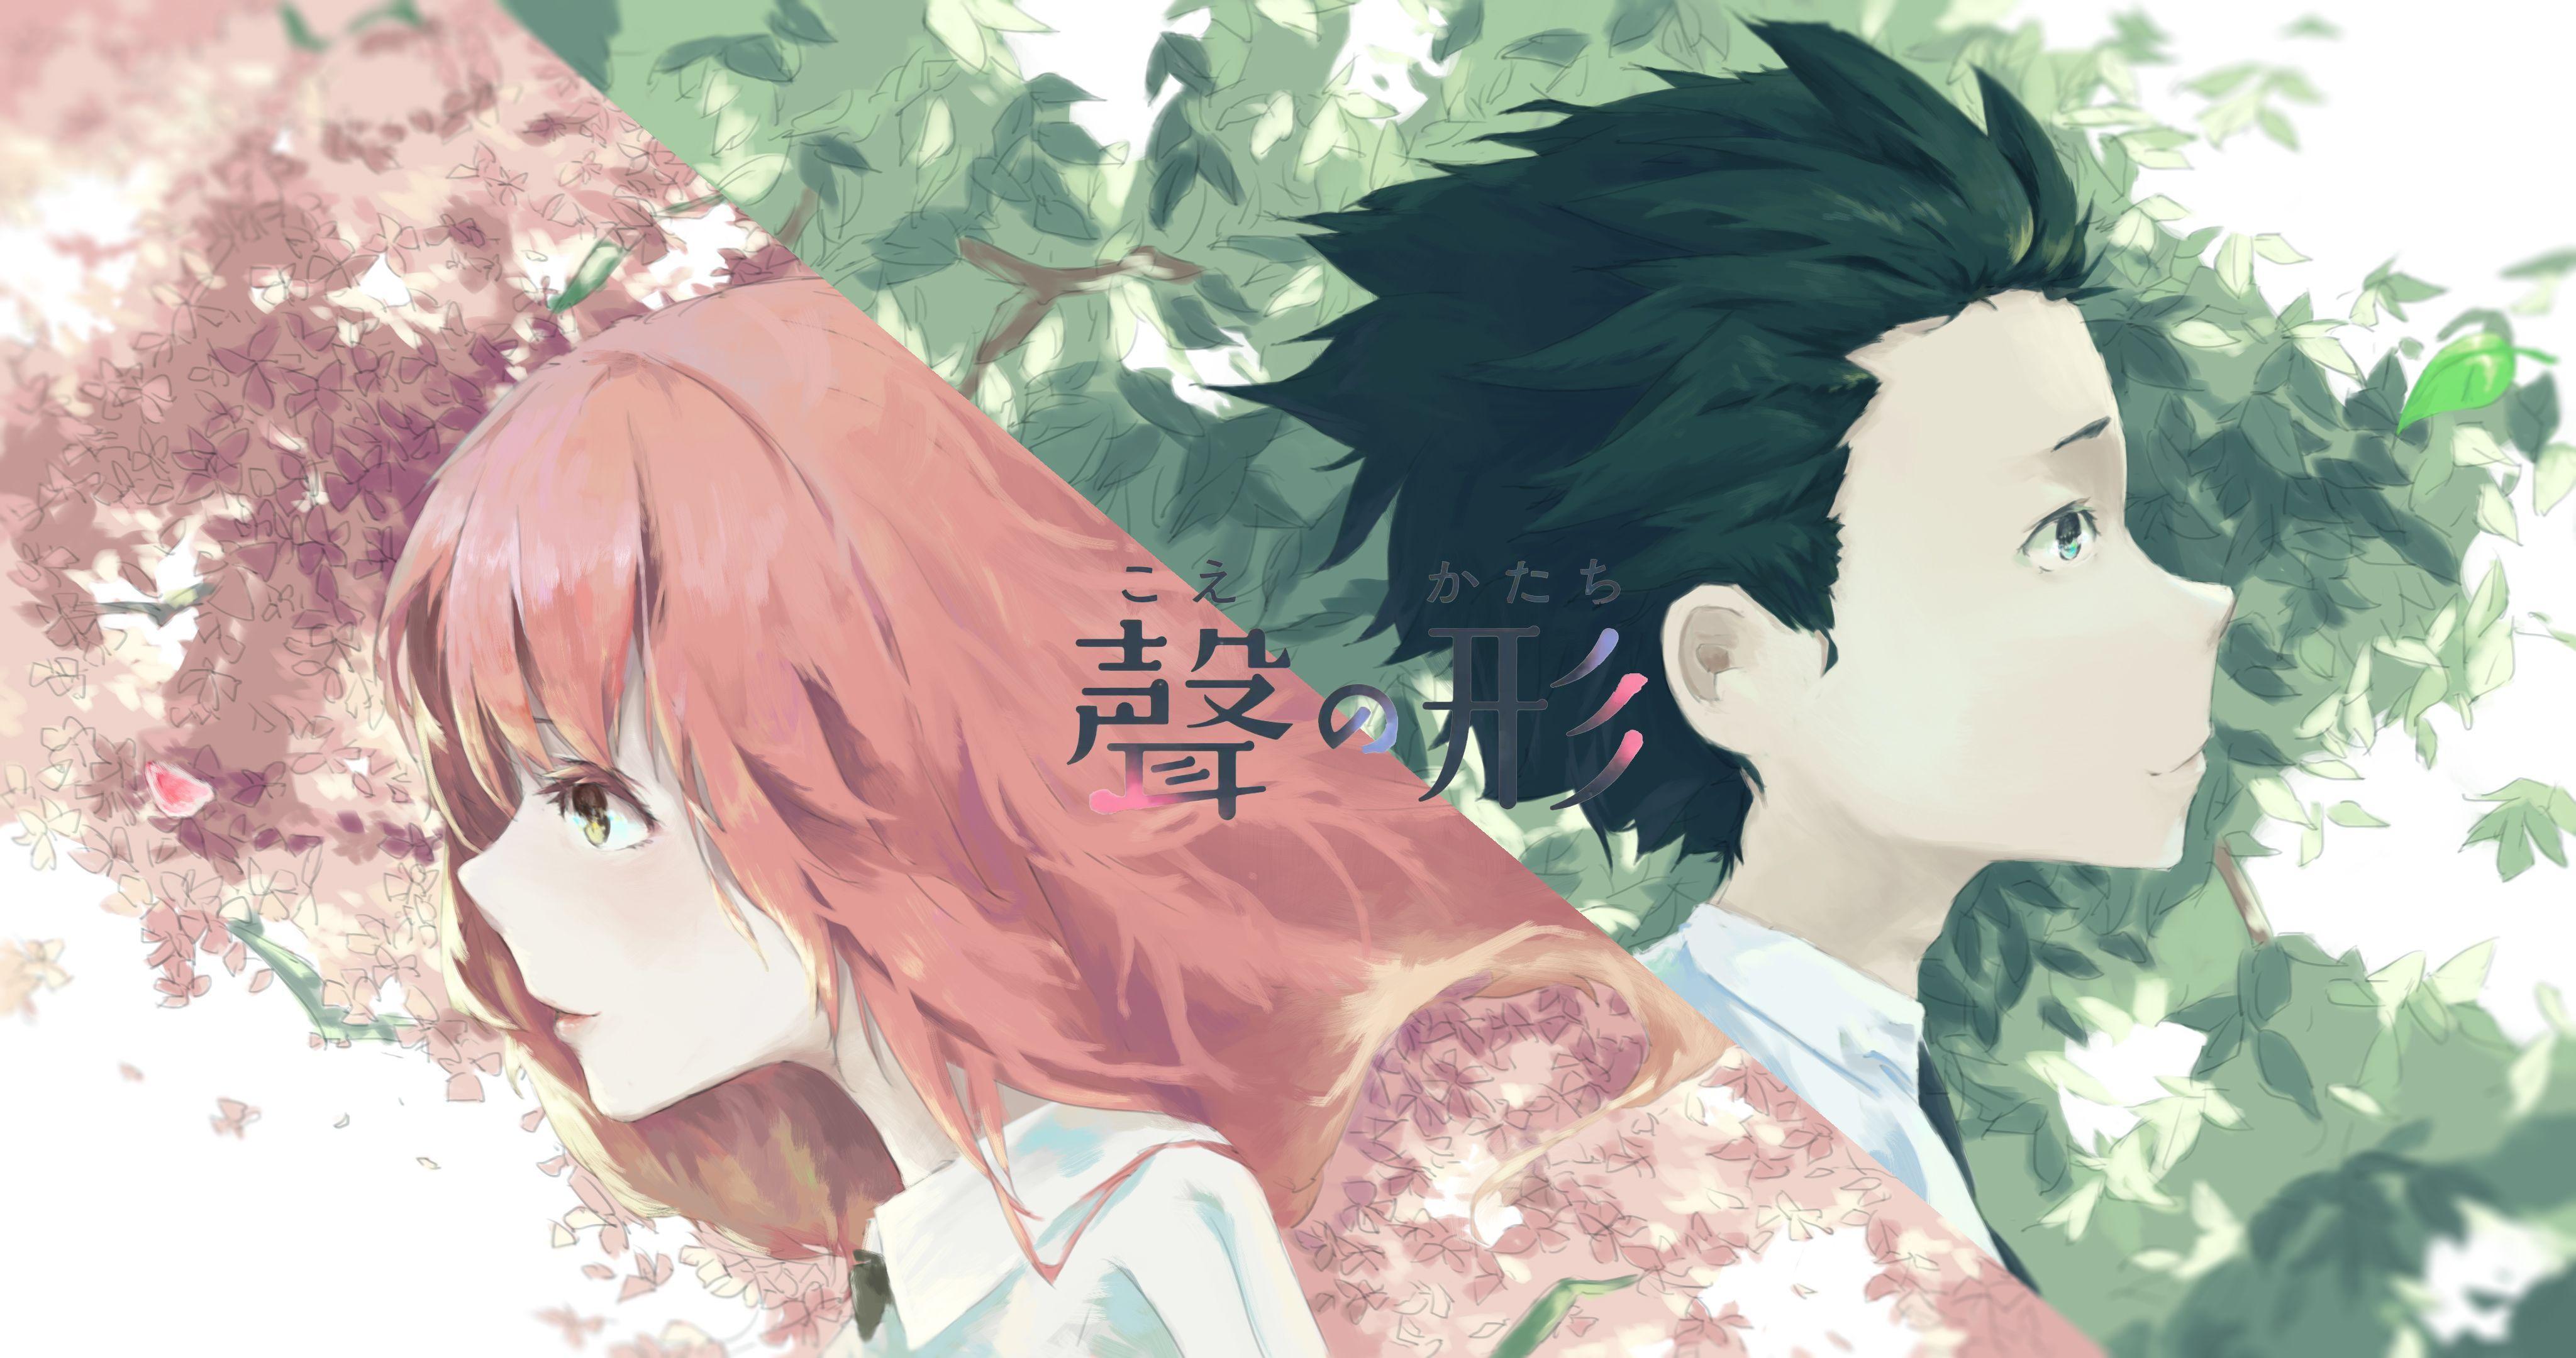 A-Silent-Voice-Ishida-Shoko-Wallpaper